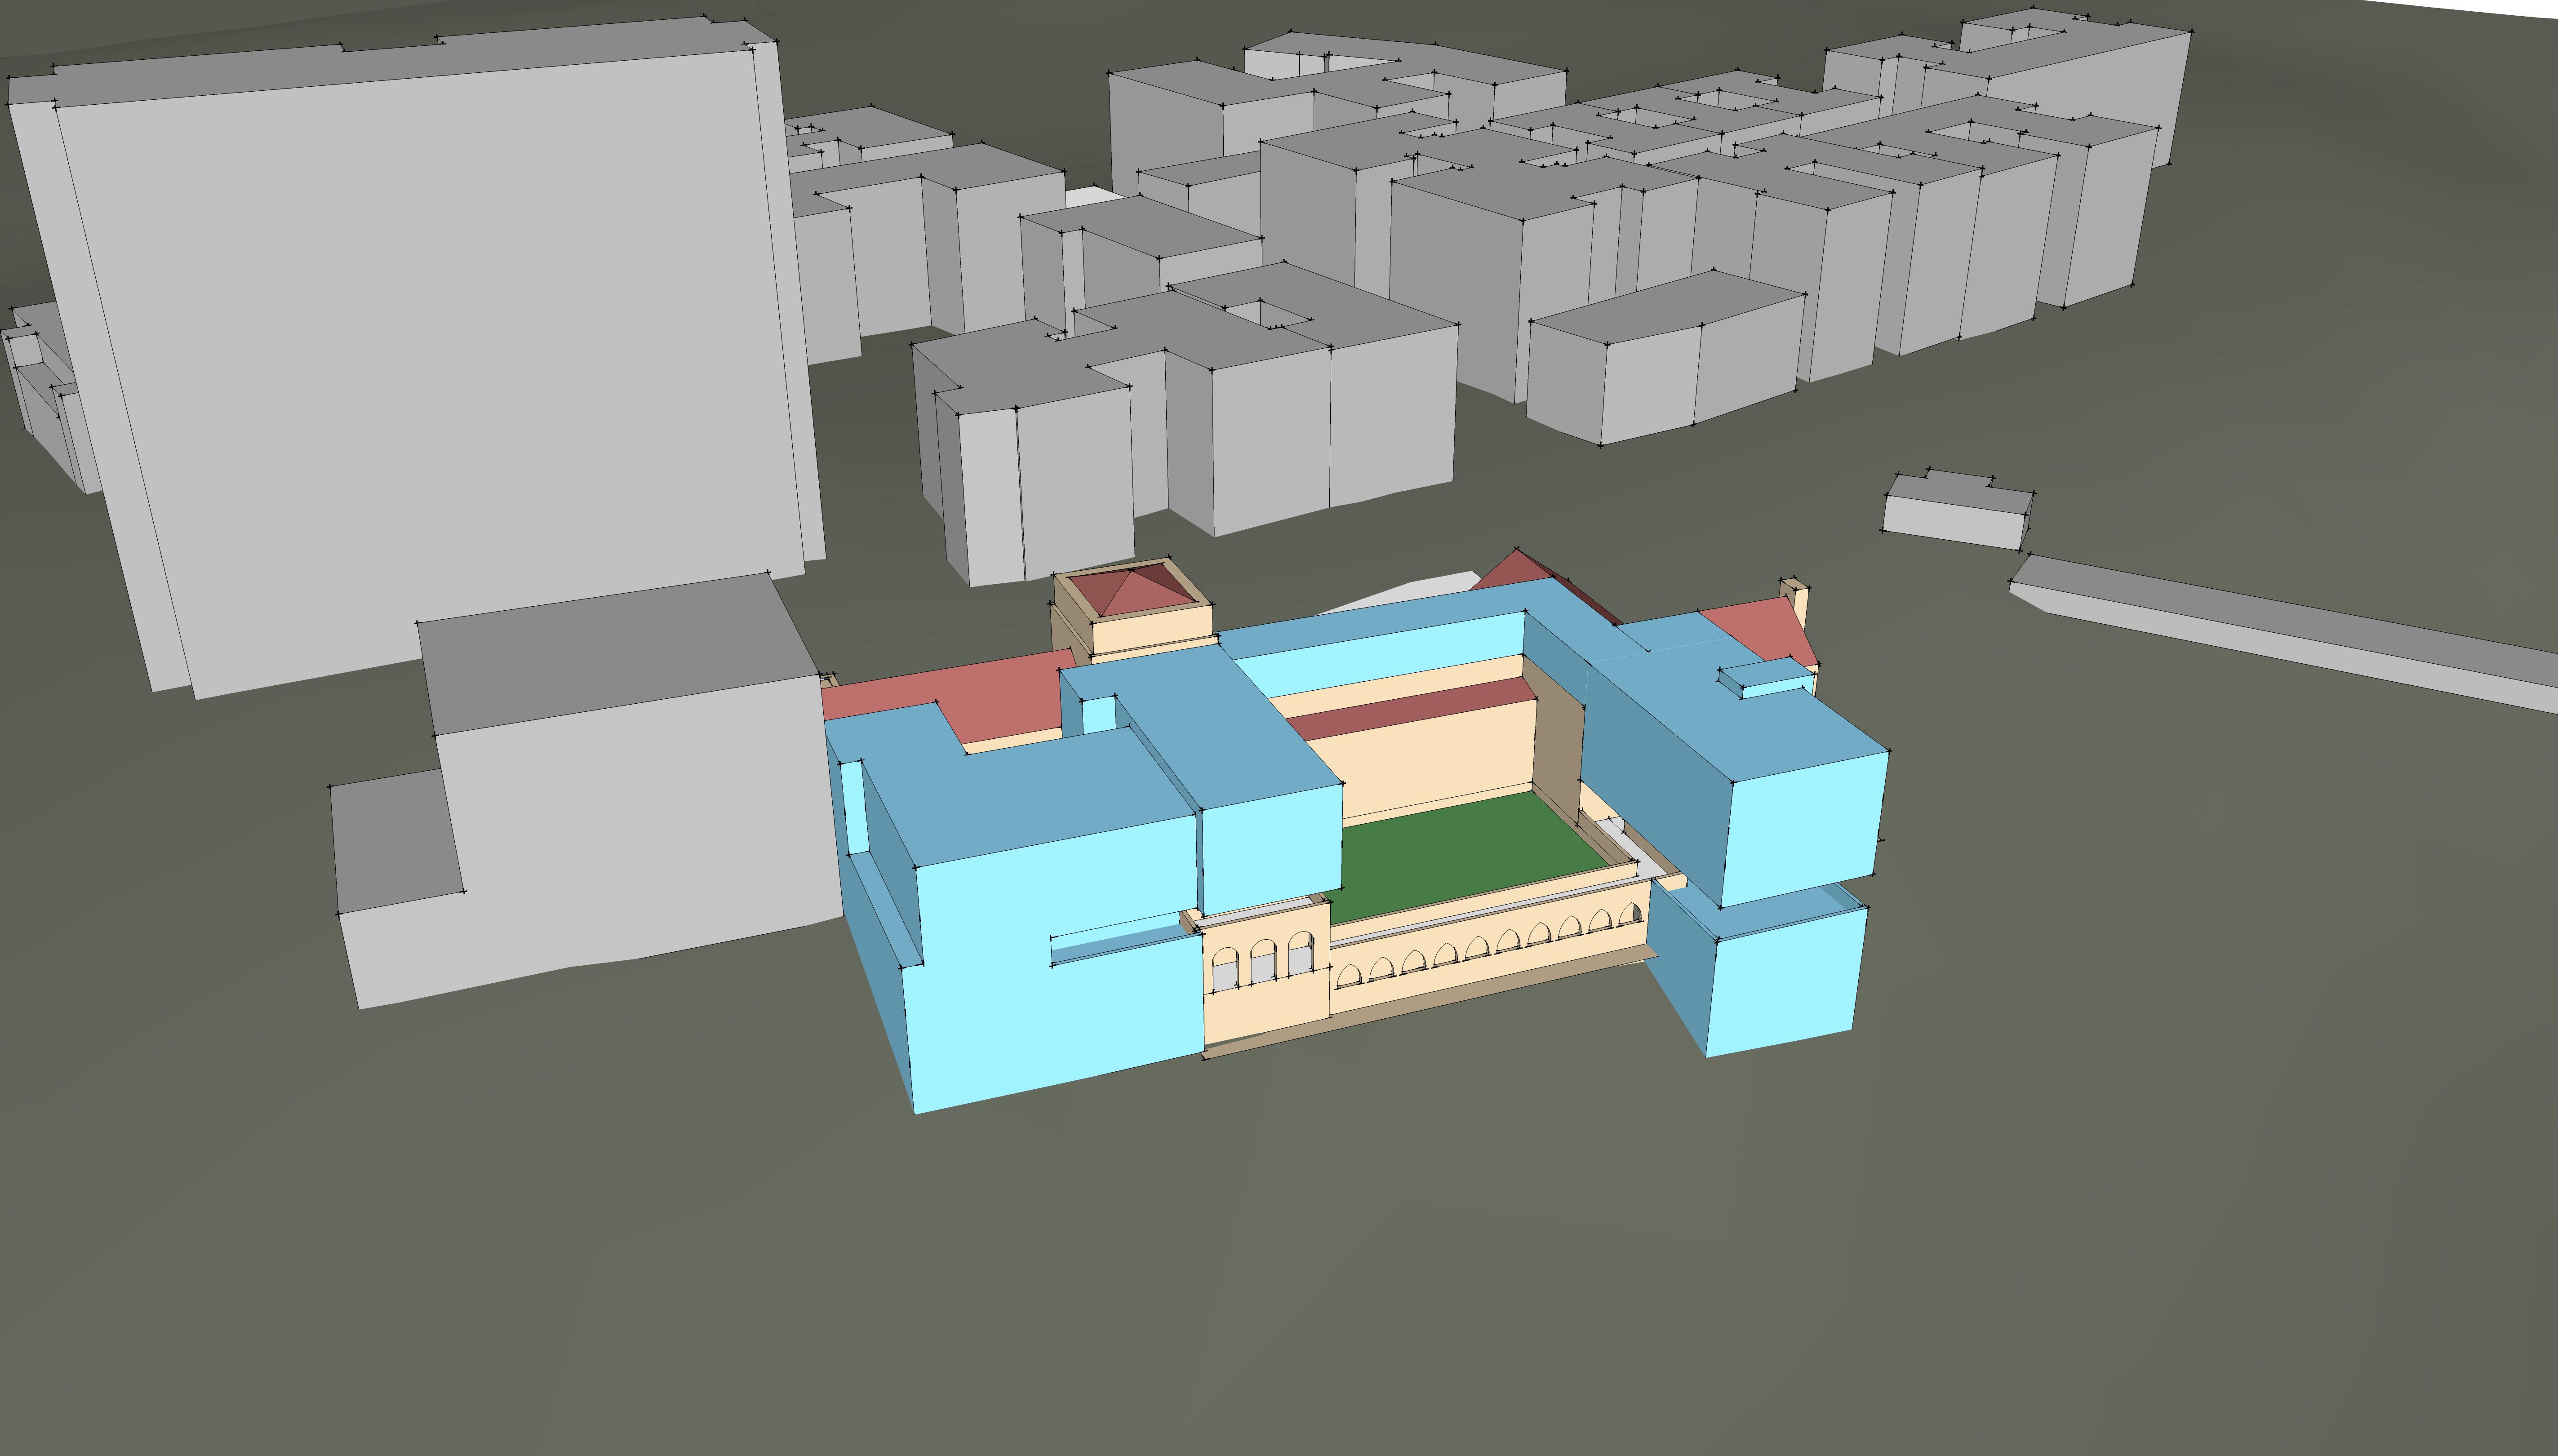 P-1225 Design Study-Massing